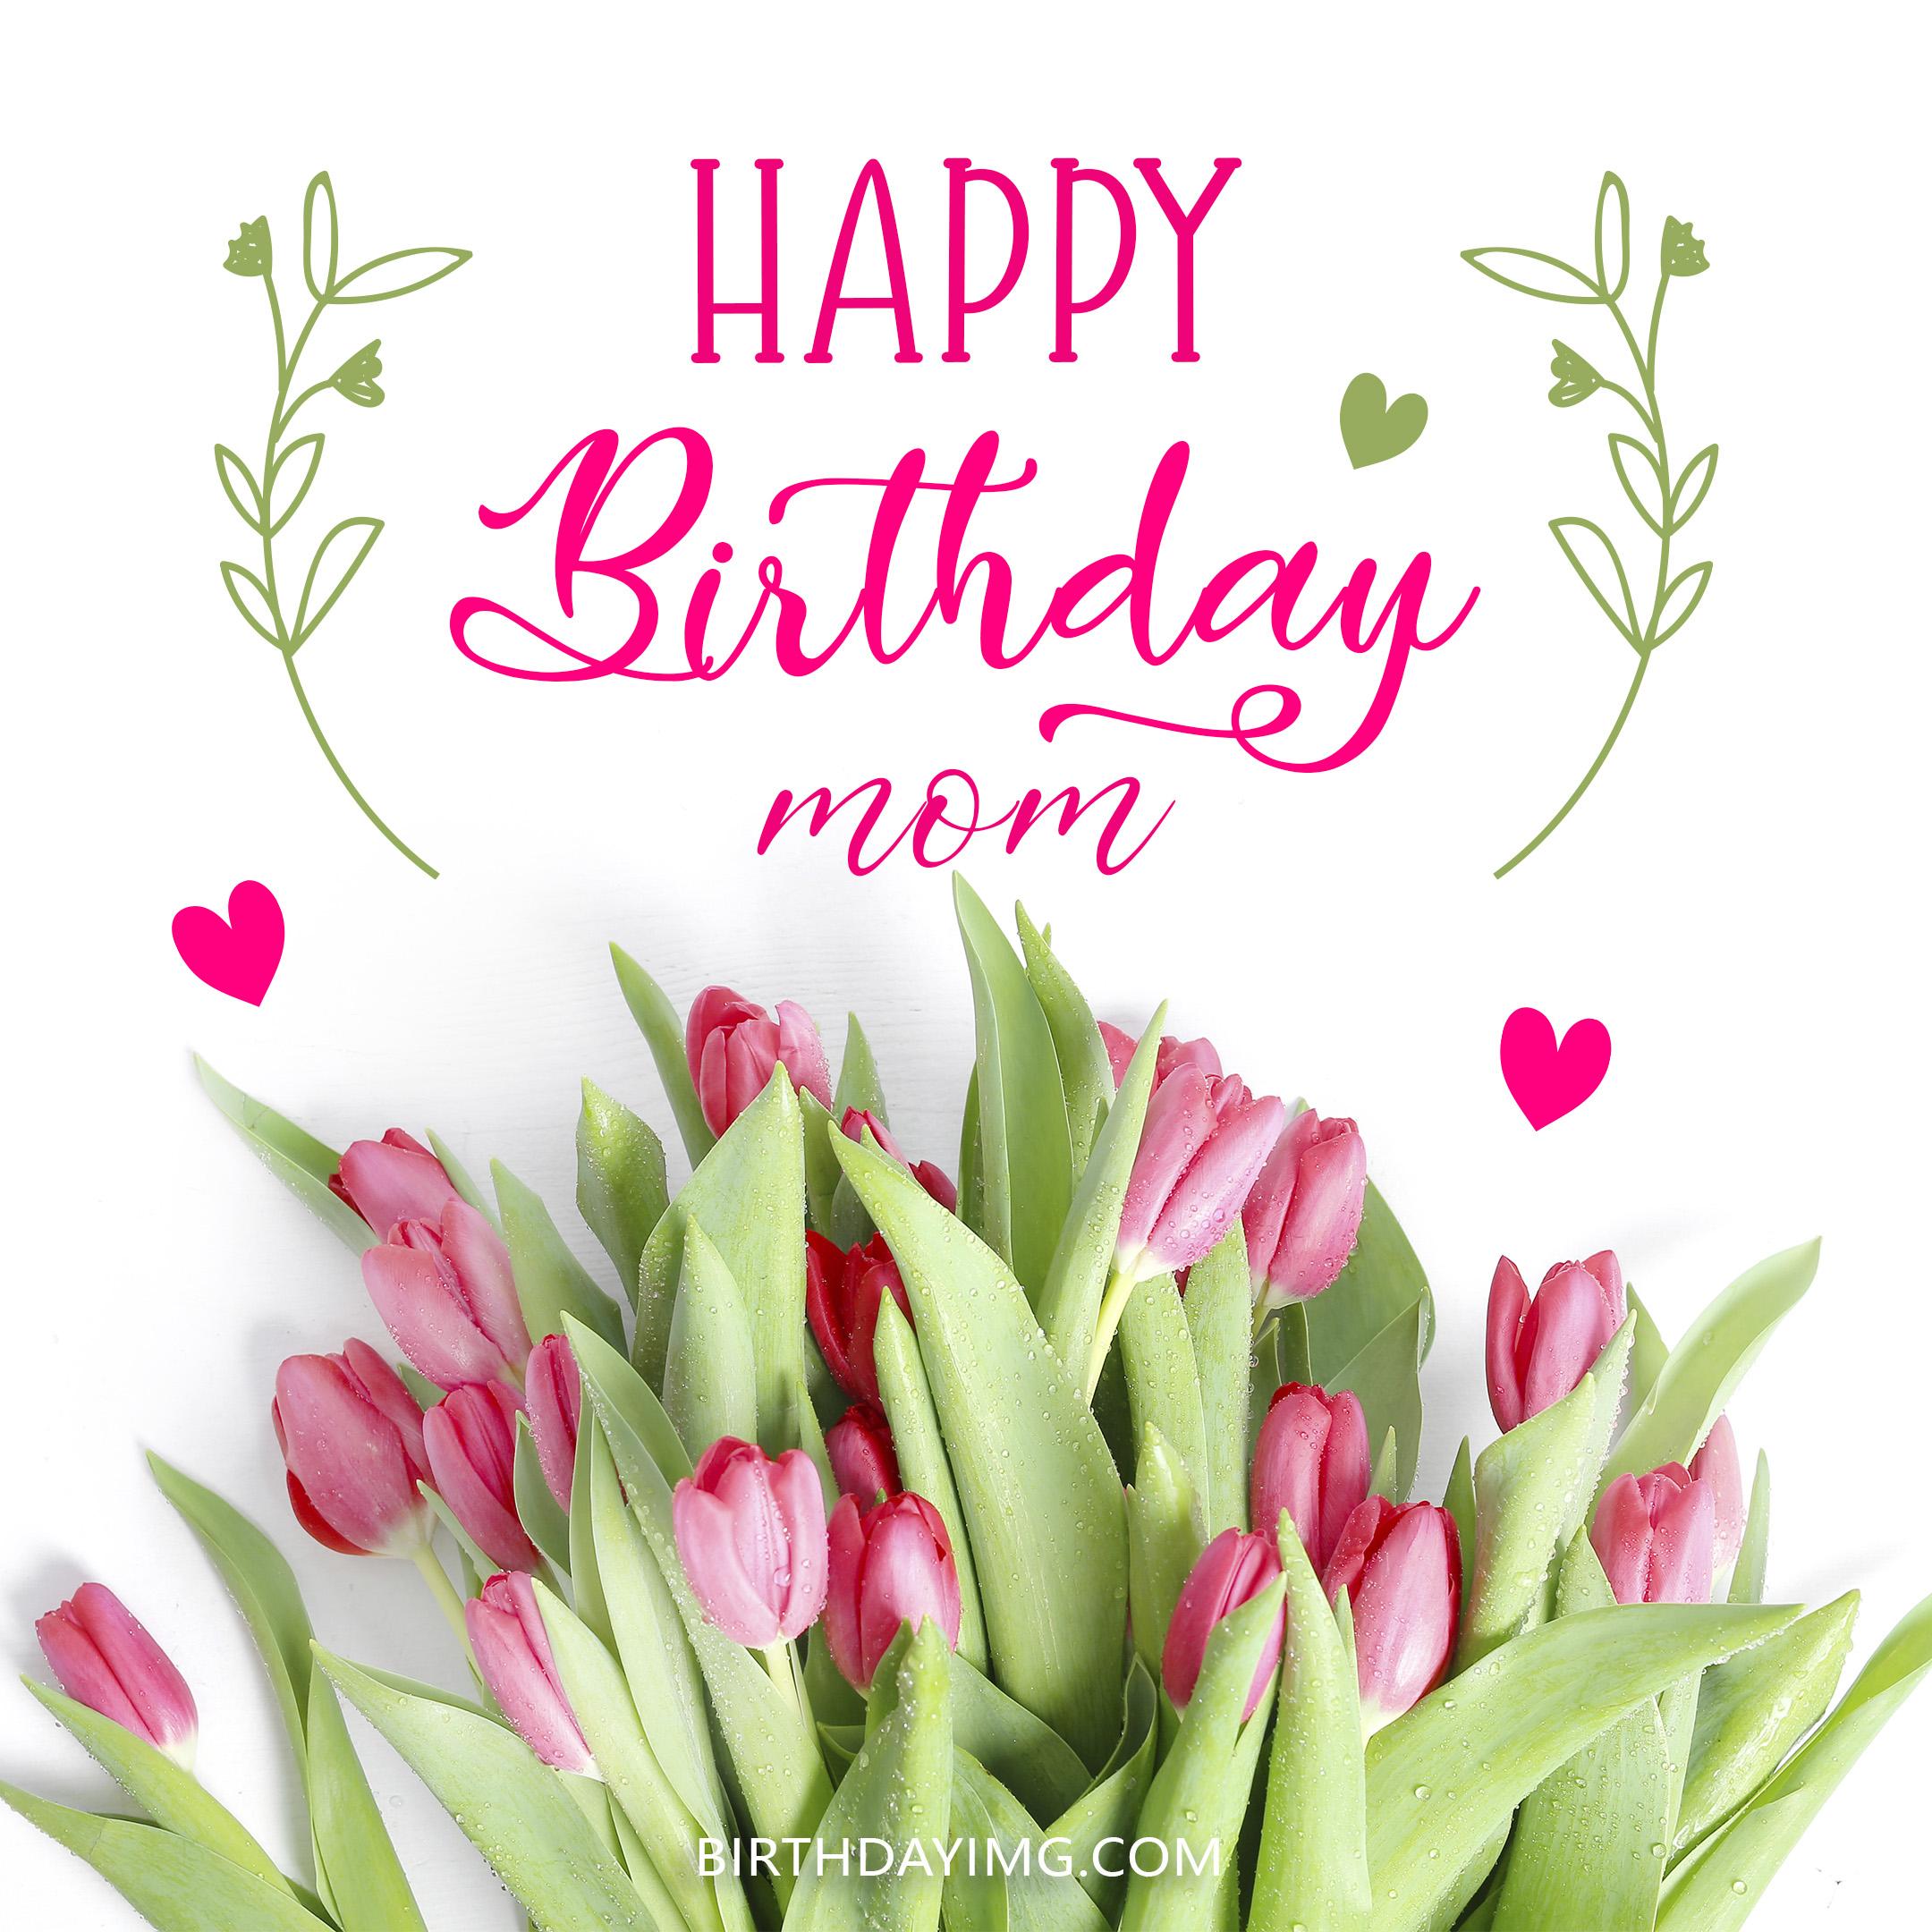 Free Happy Birthday Image For Mom With Pink Tulips - birthdayimg.com